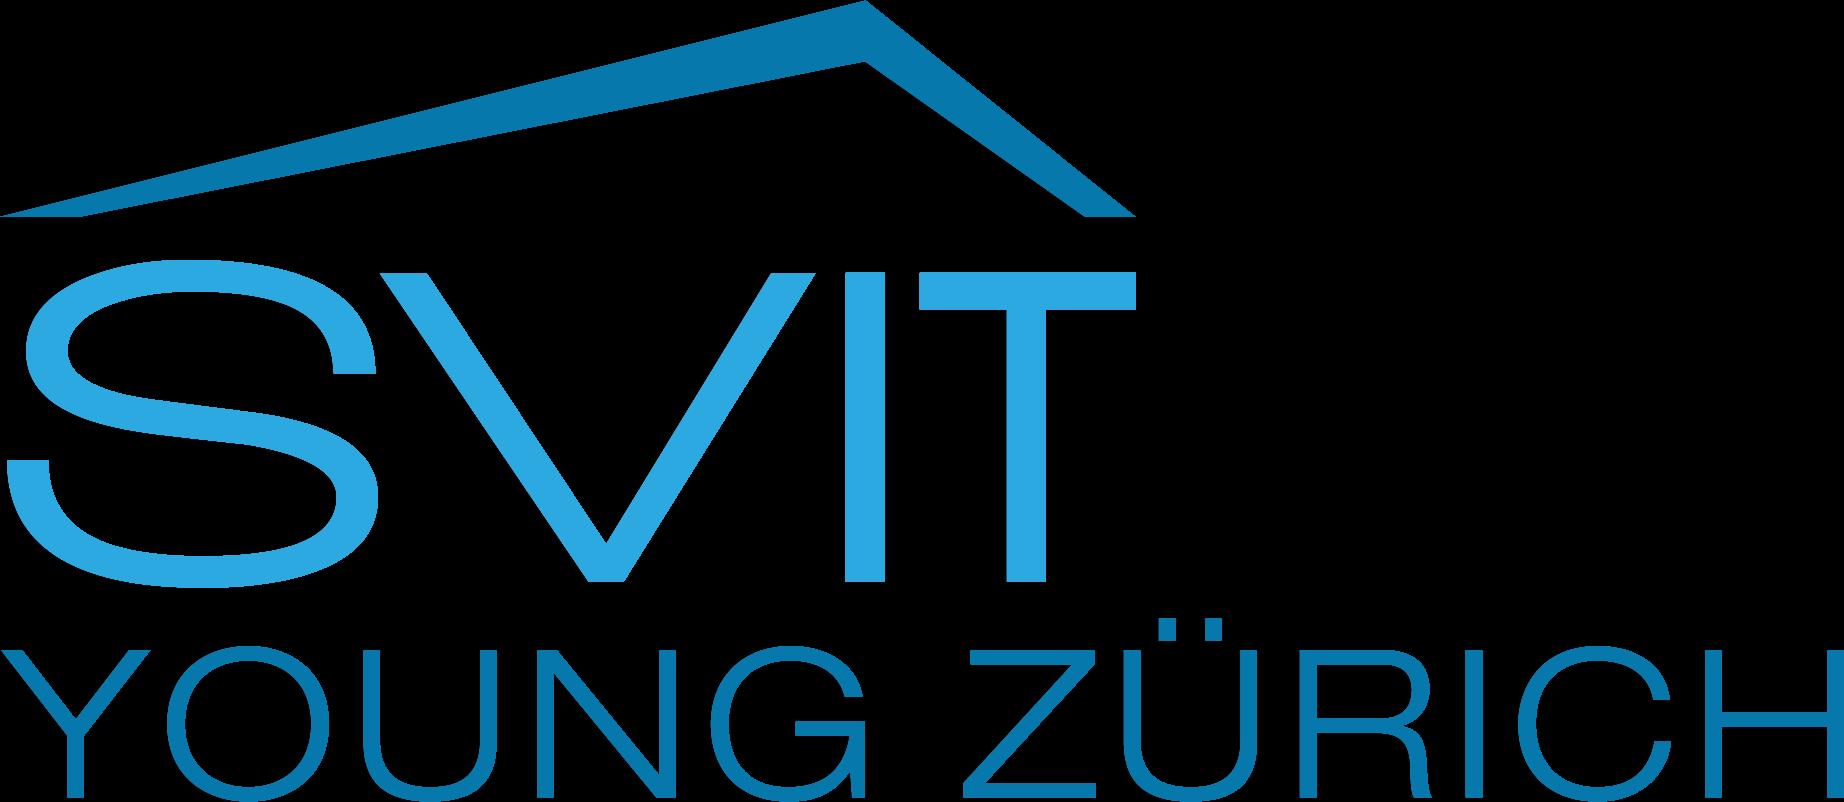 SVIT Young Zürich